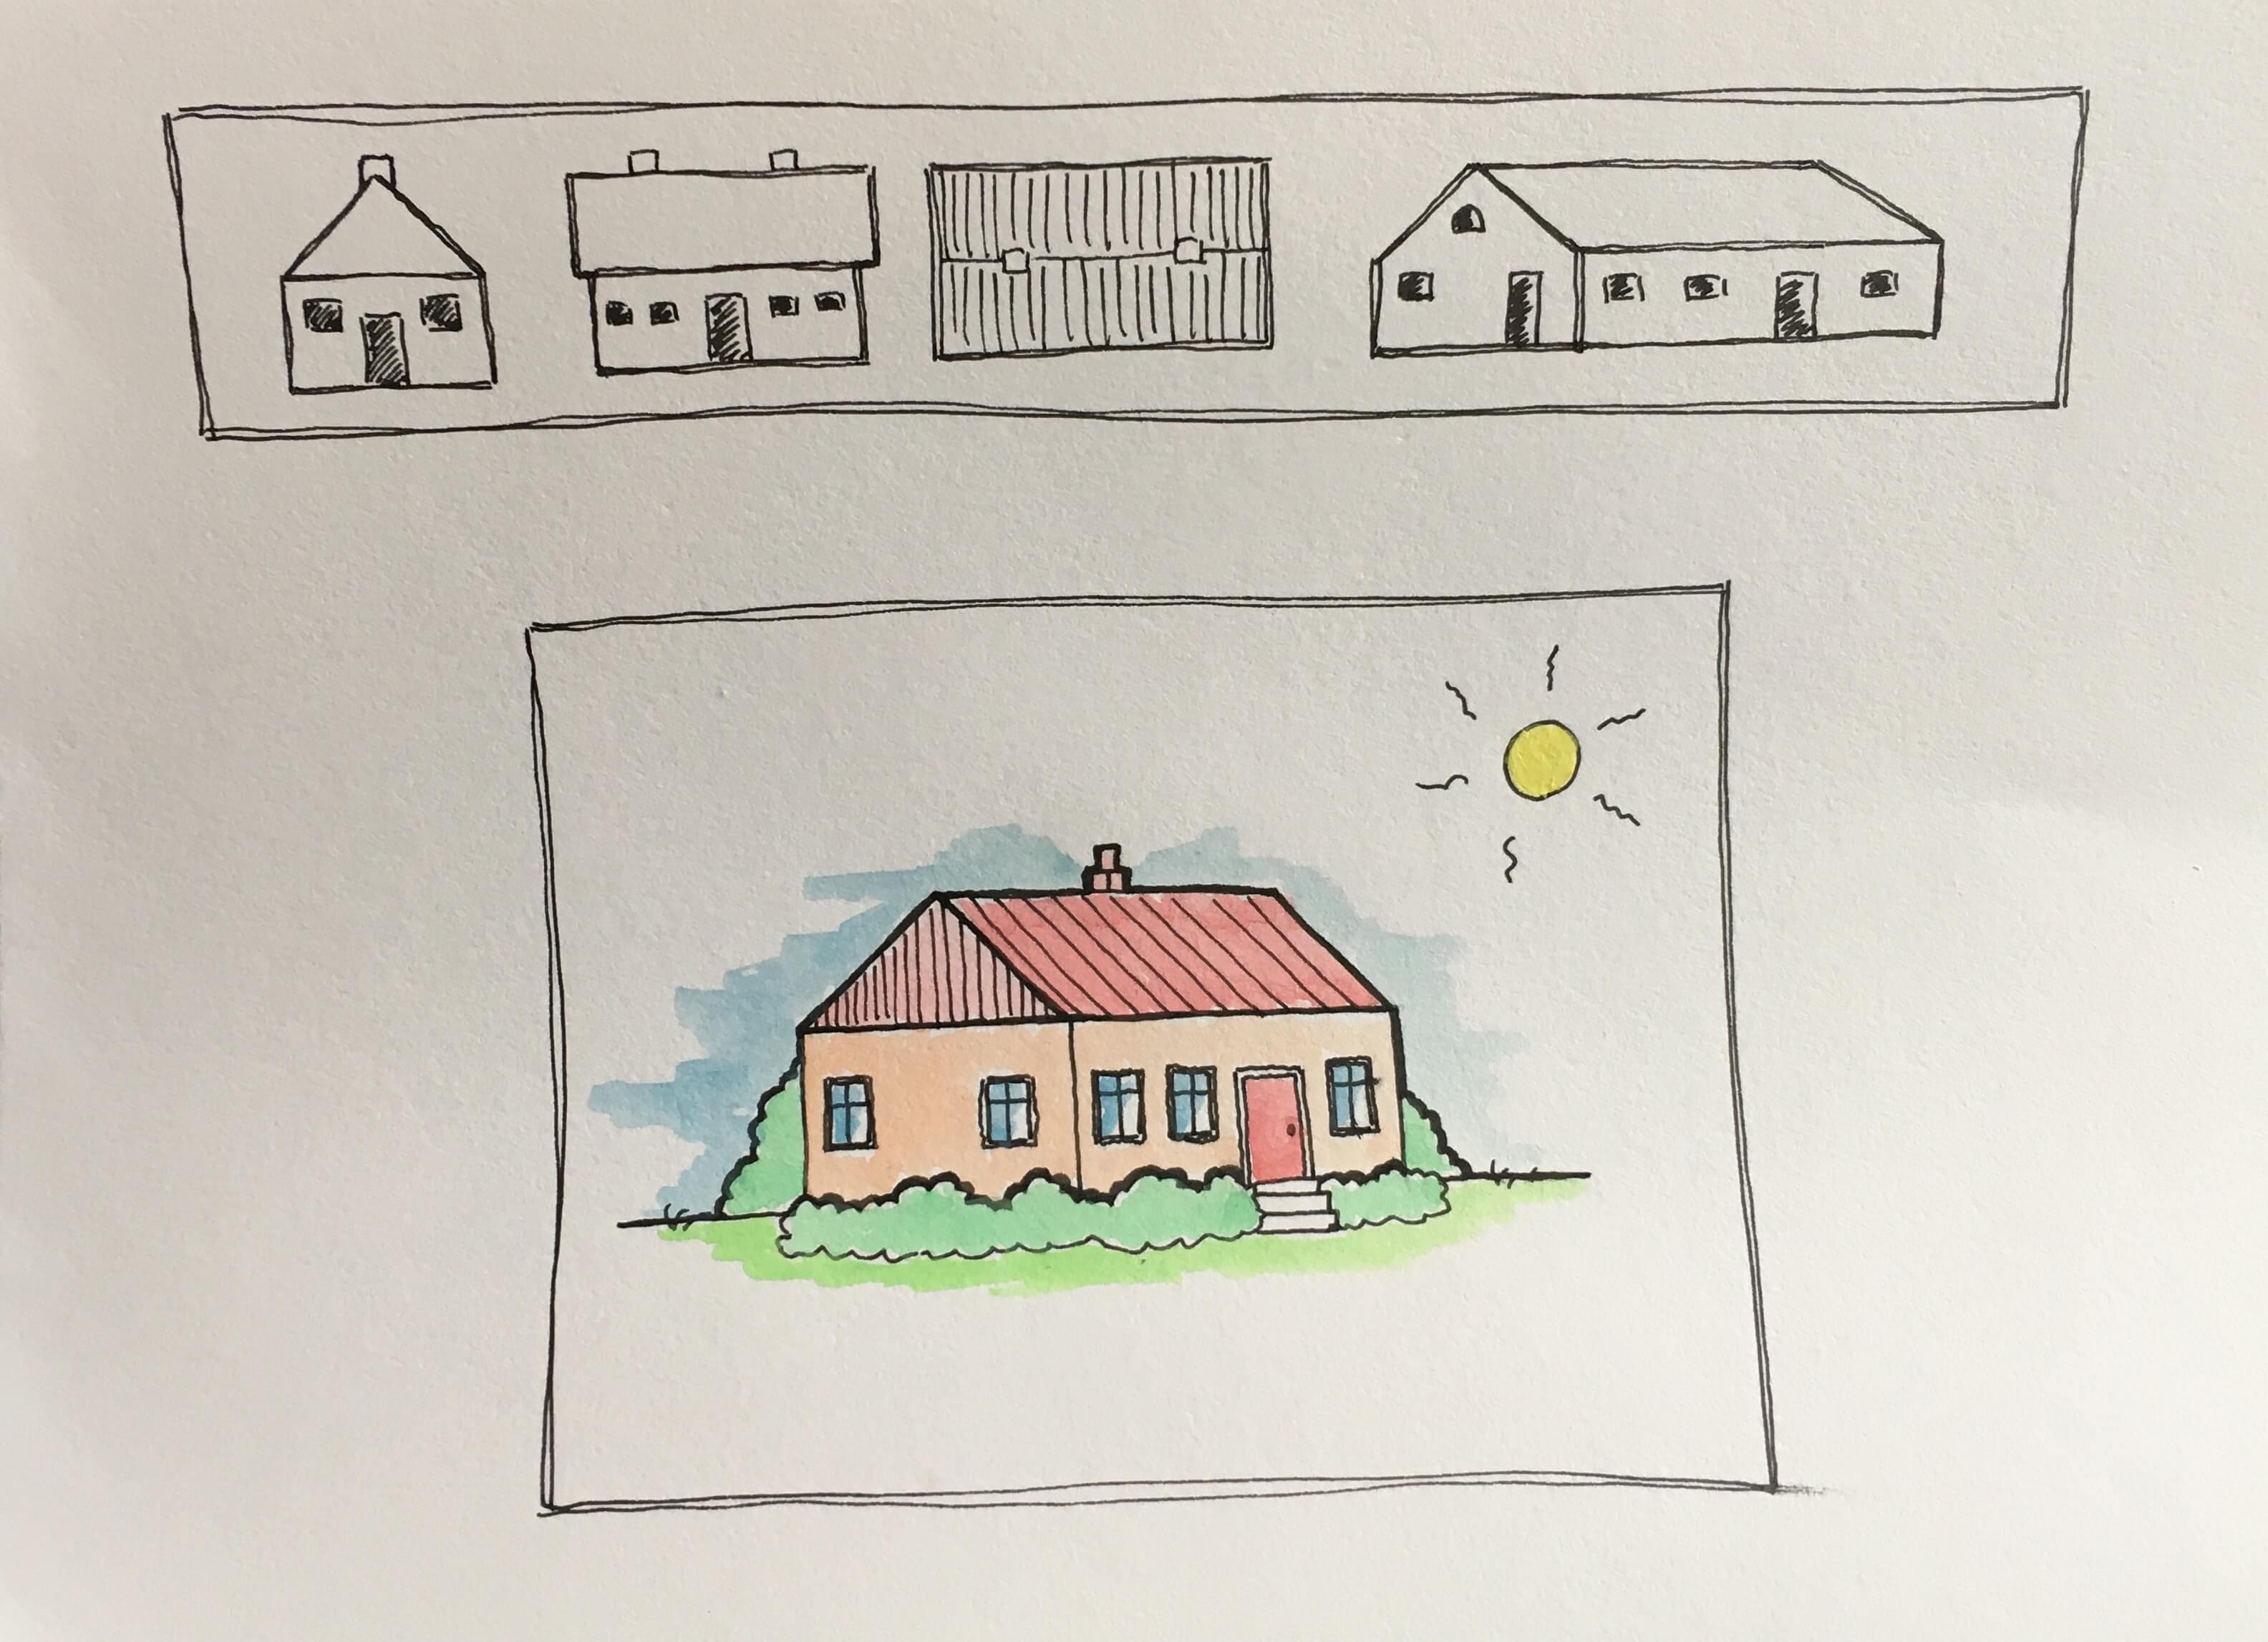 Tegnet hus